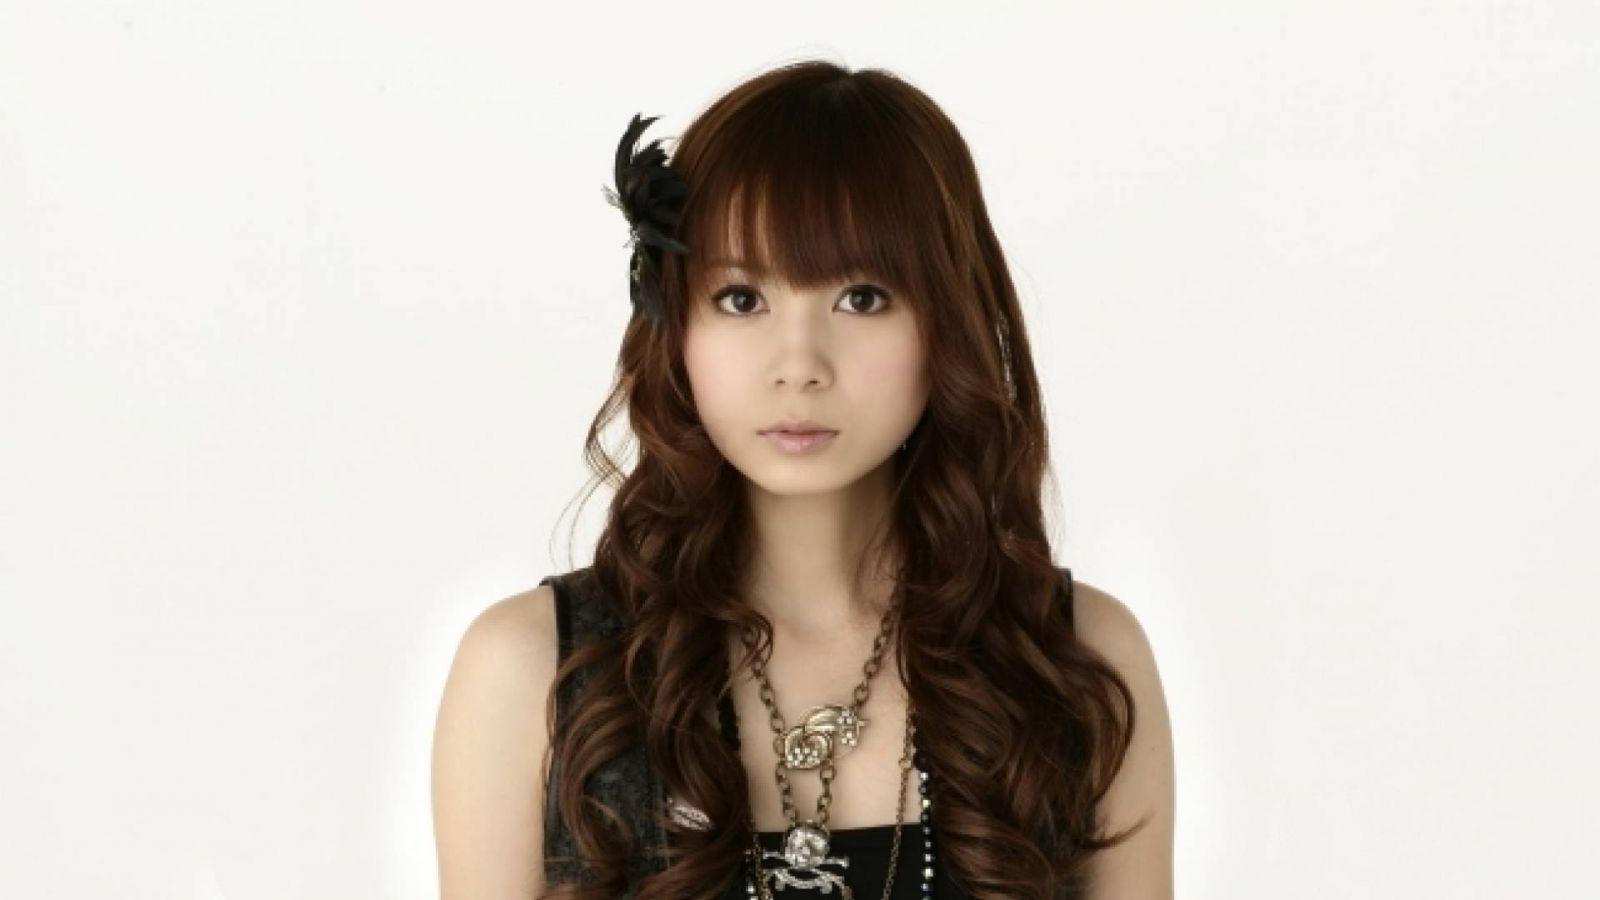 Novo single e DVD de Nakagawa Shoko © 2008 Sony Music Entertainment (Japan) Inc.